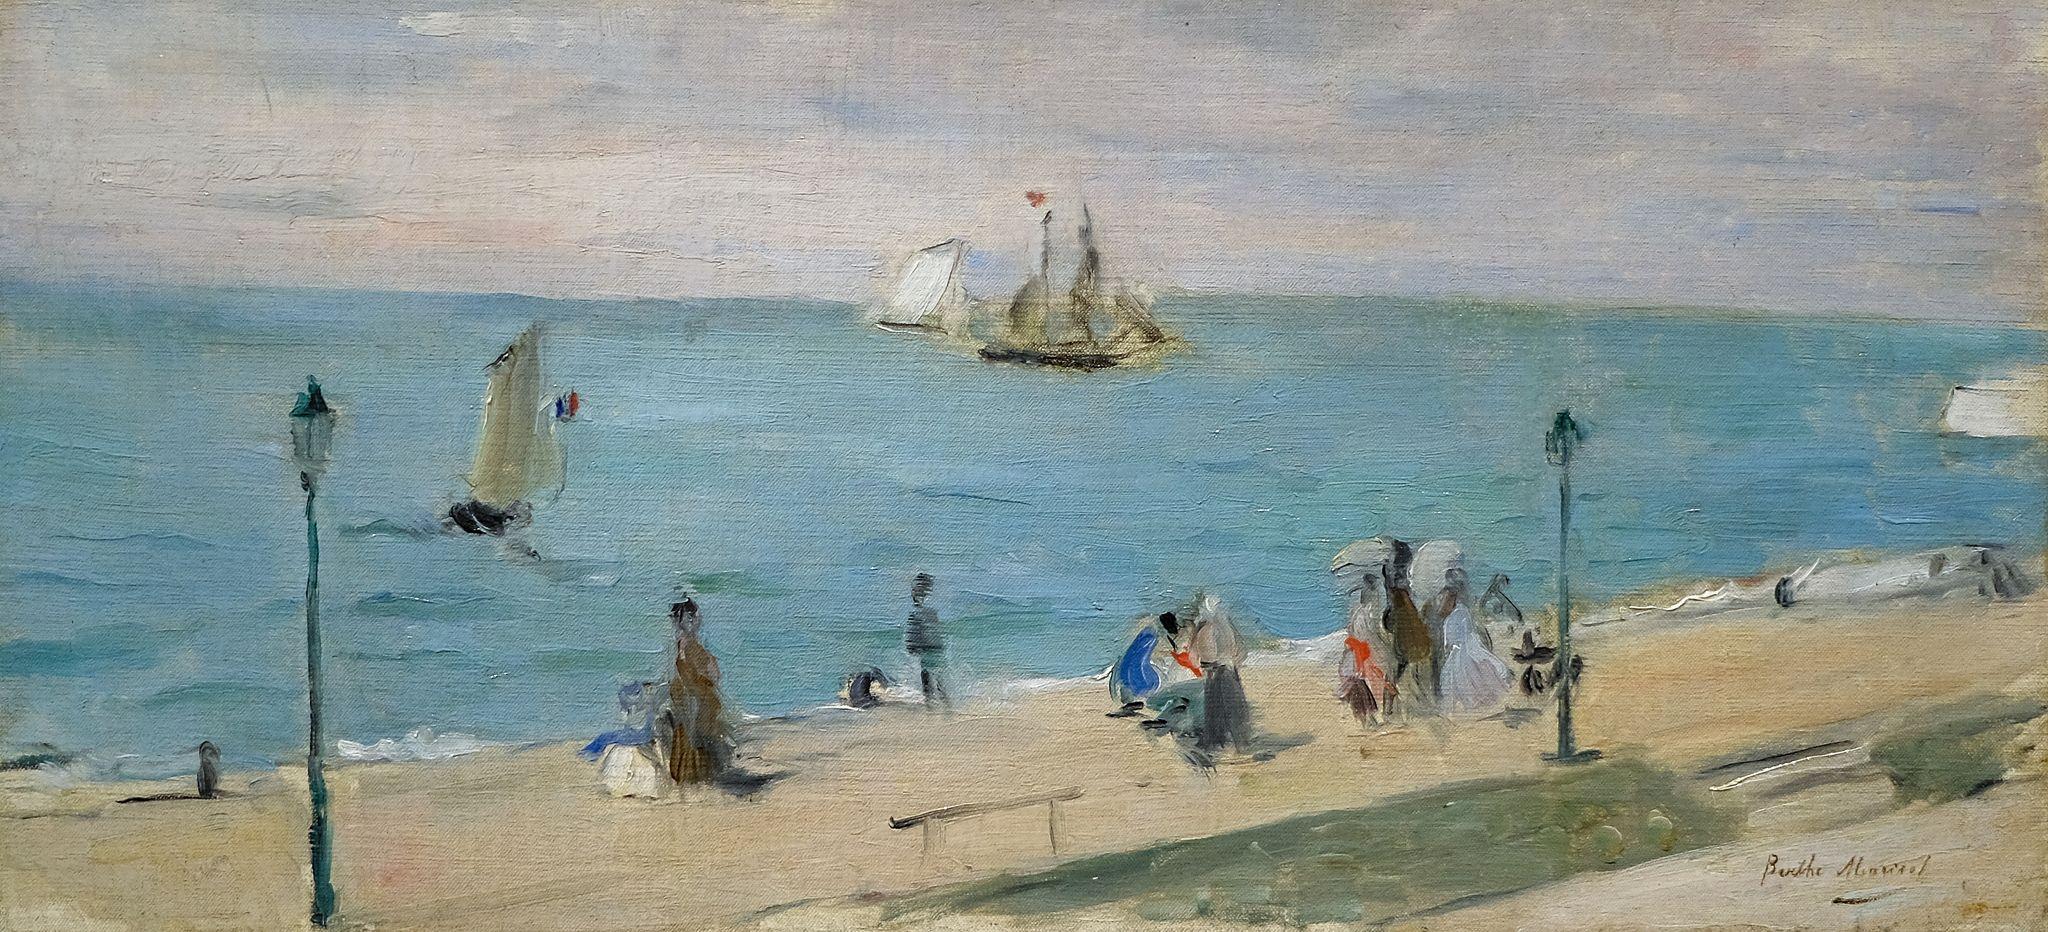 Berthe Morisot, On the Beach, 1873 3/10/19 #fristartmuseum | Morisot, Berthe  morisot, Painting reproductions